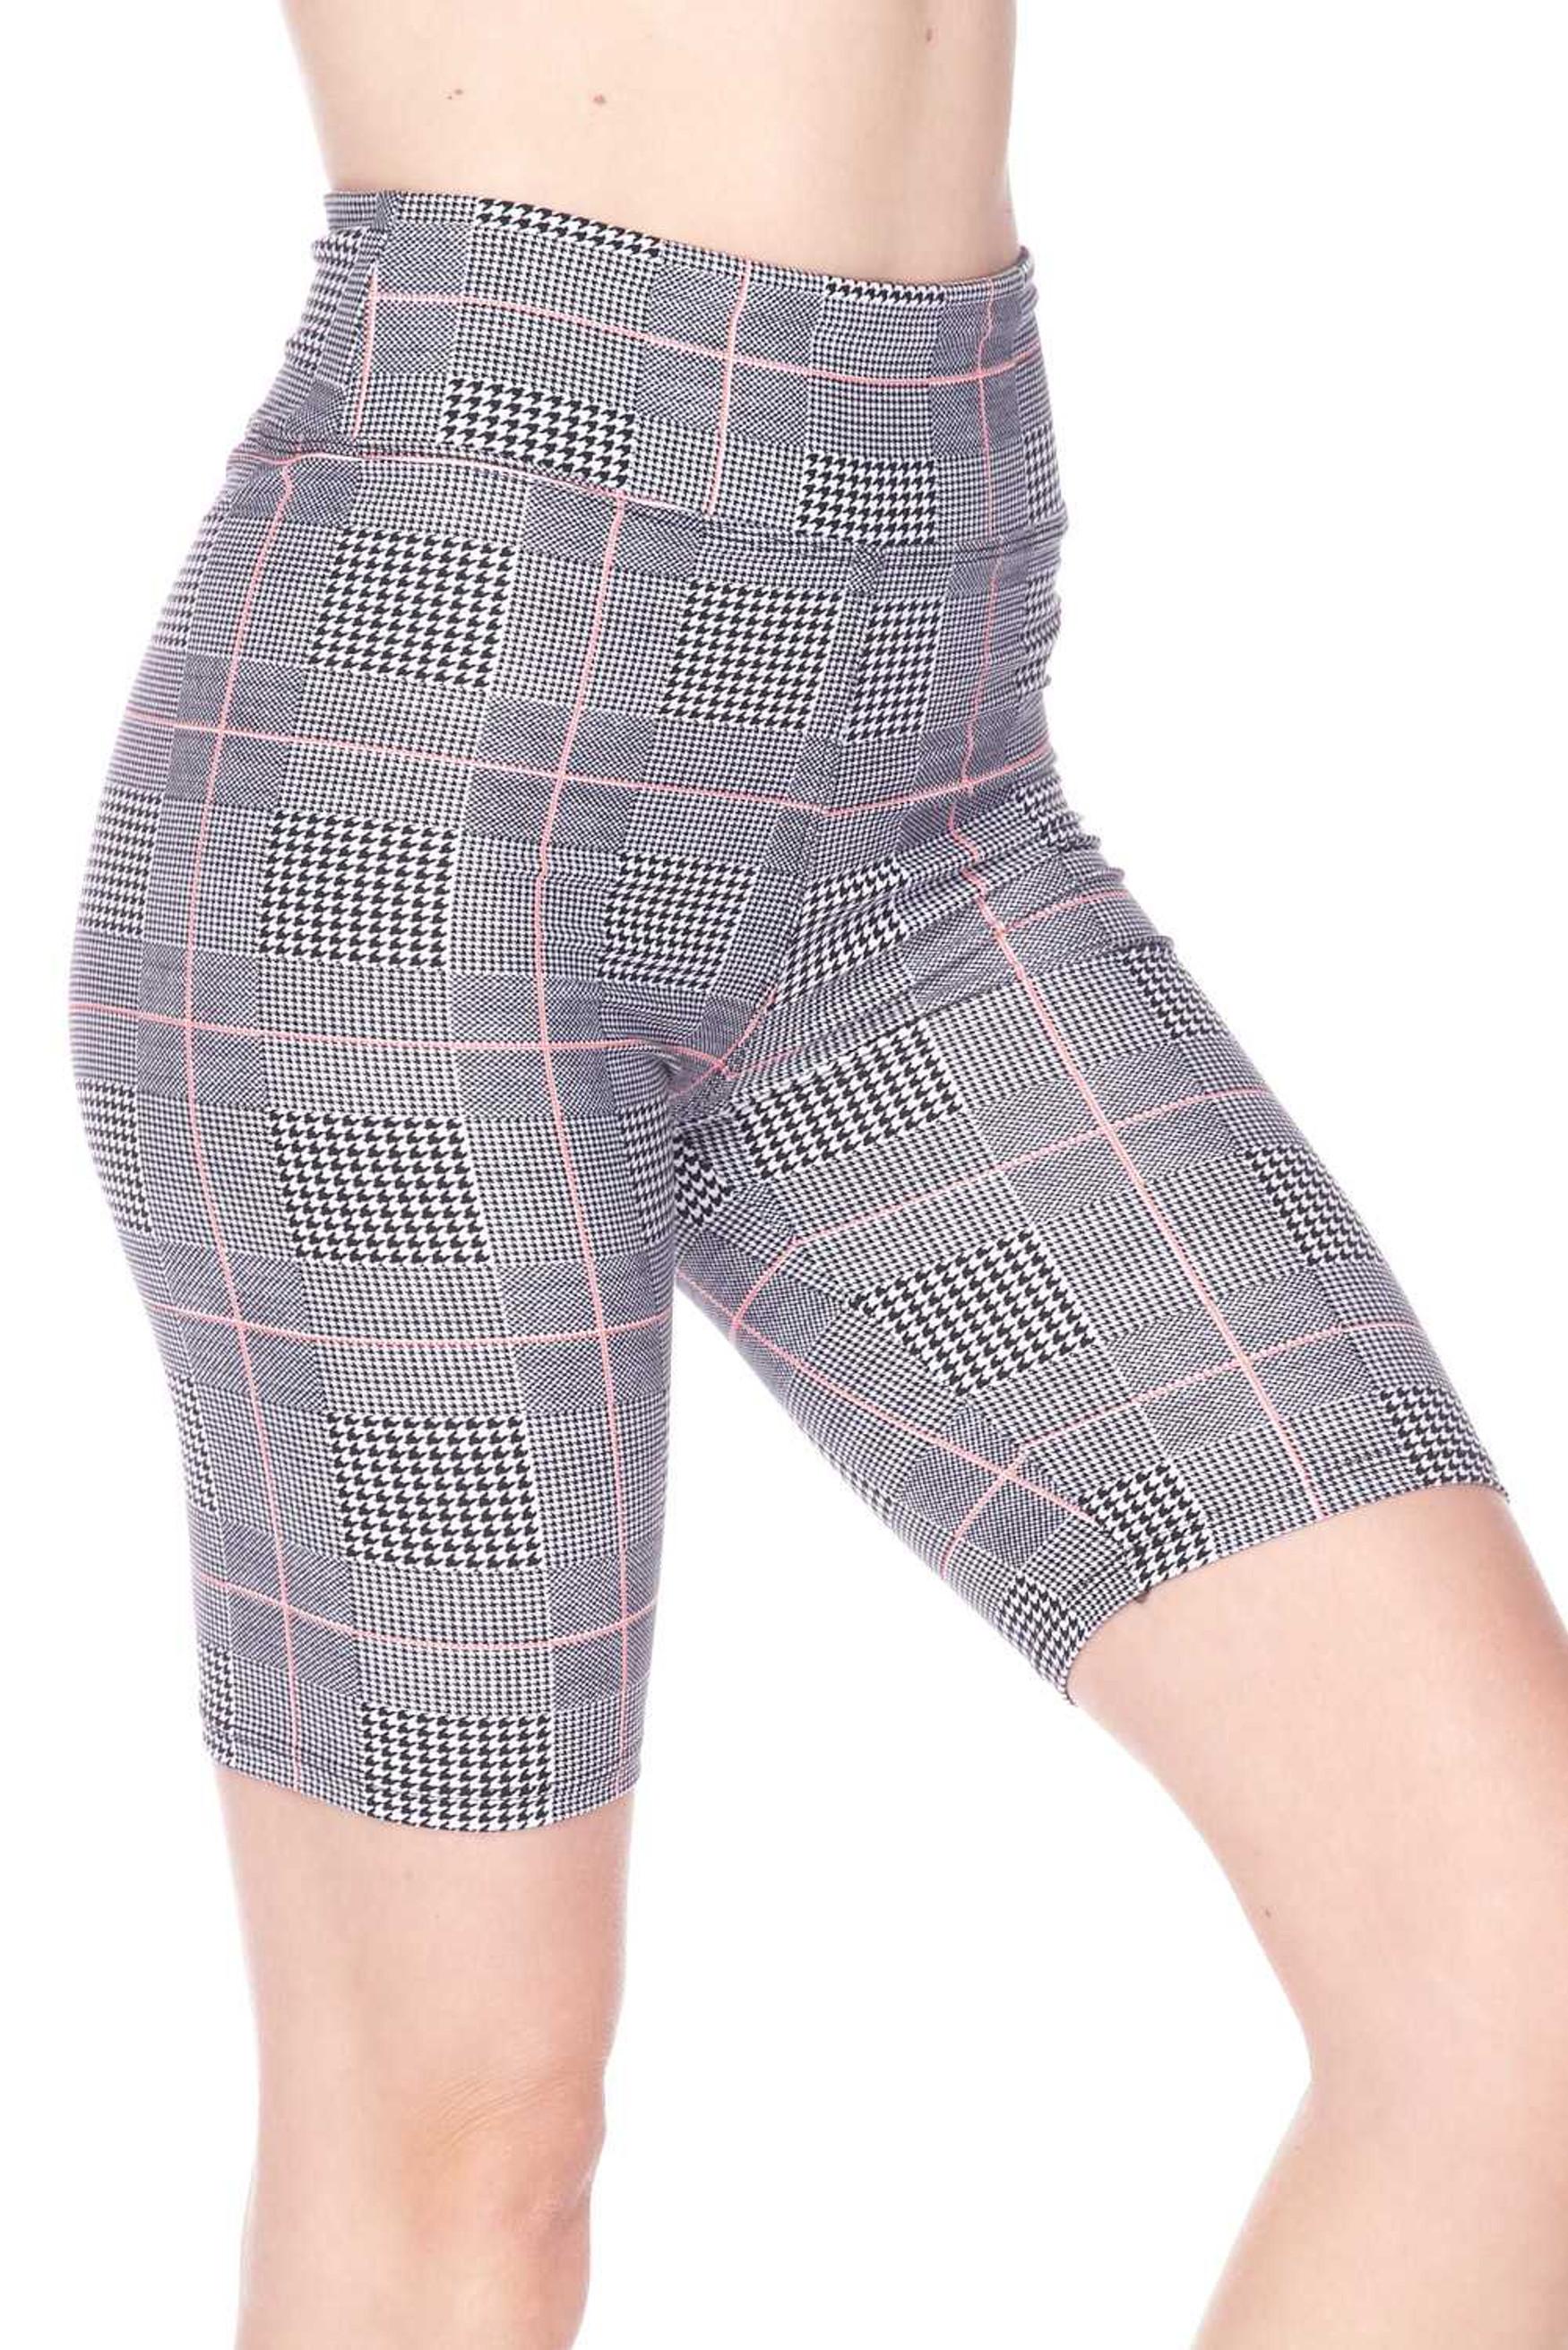 Buttery Soft Coral Accent Glenn Plaid Plus Size Biker Shorts - 3 Inch Waist Band